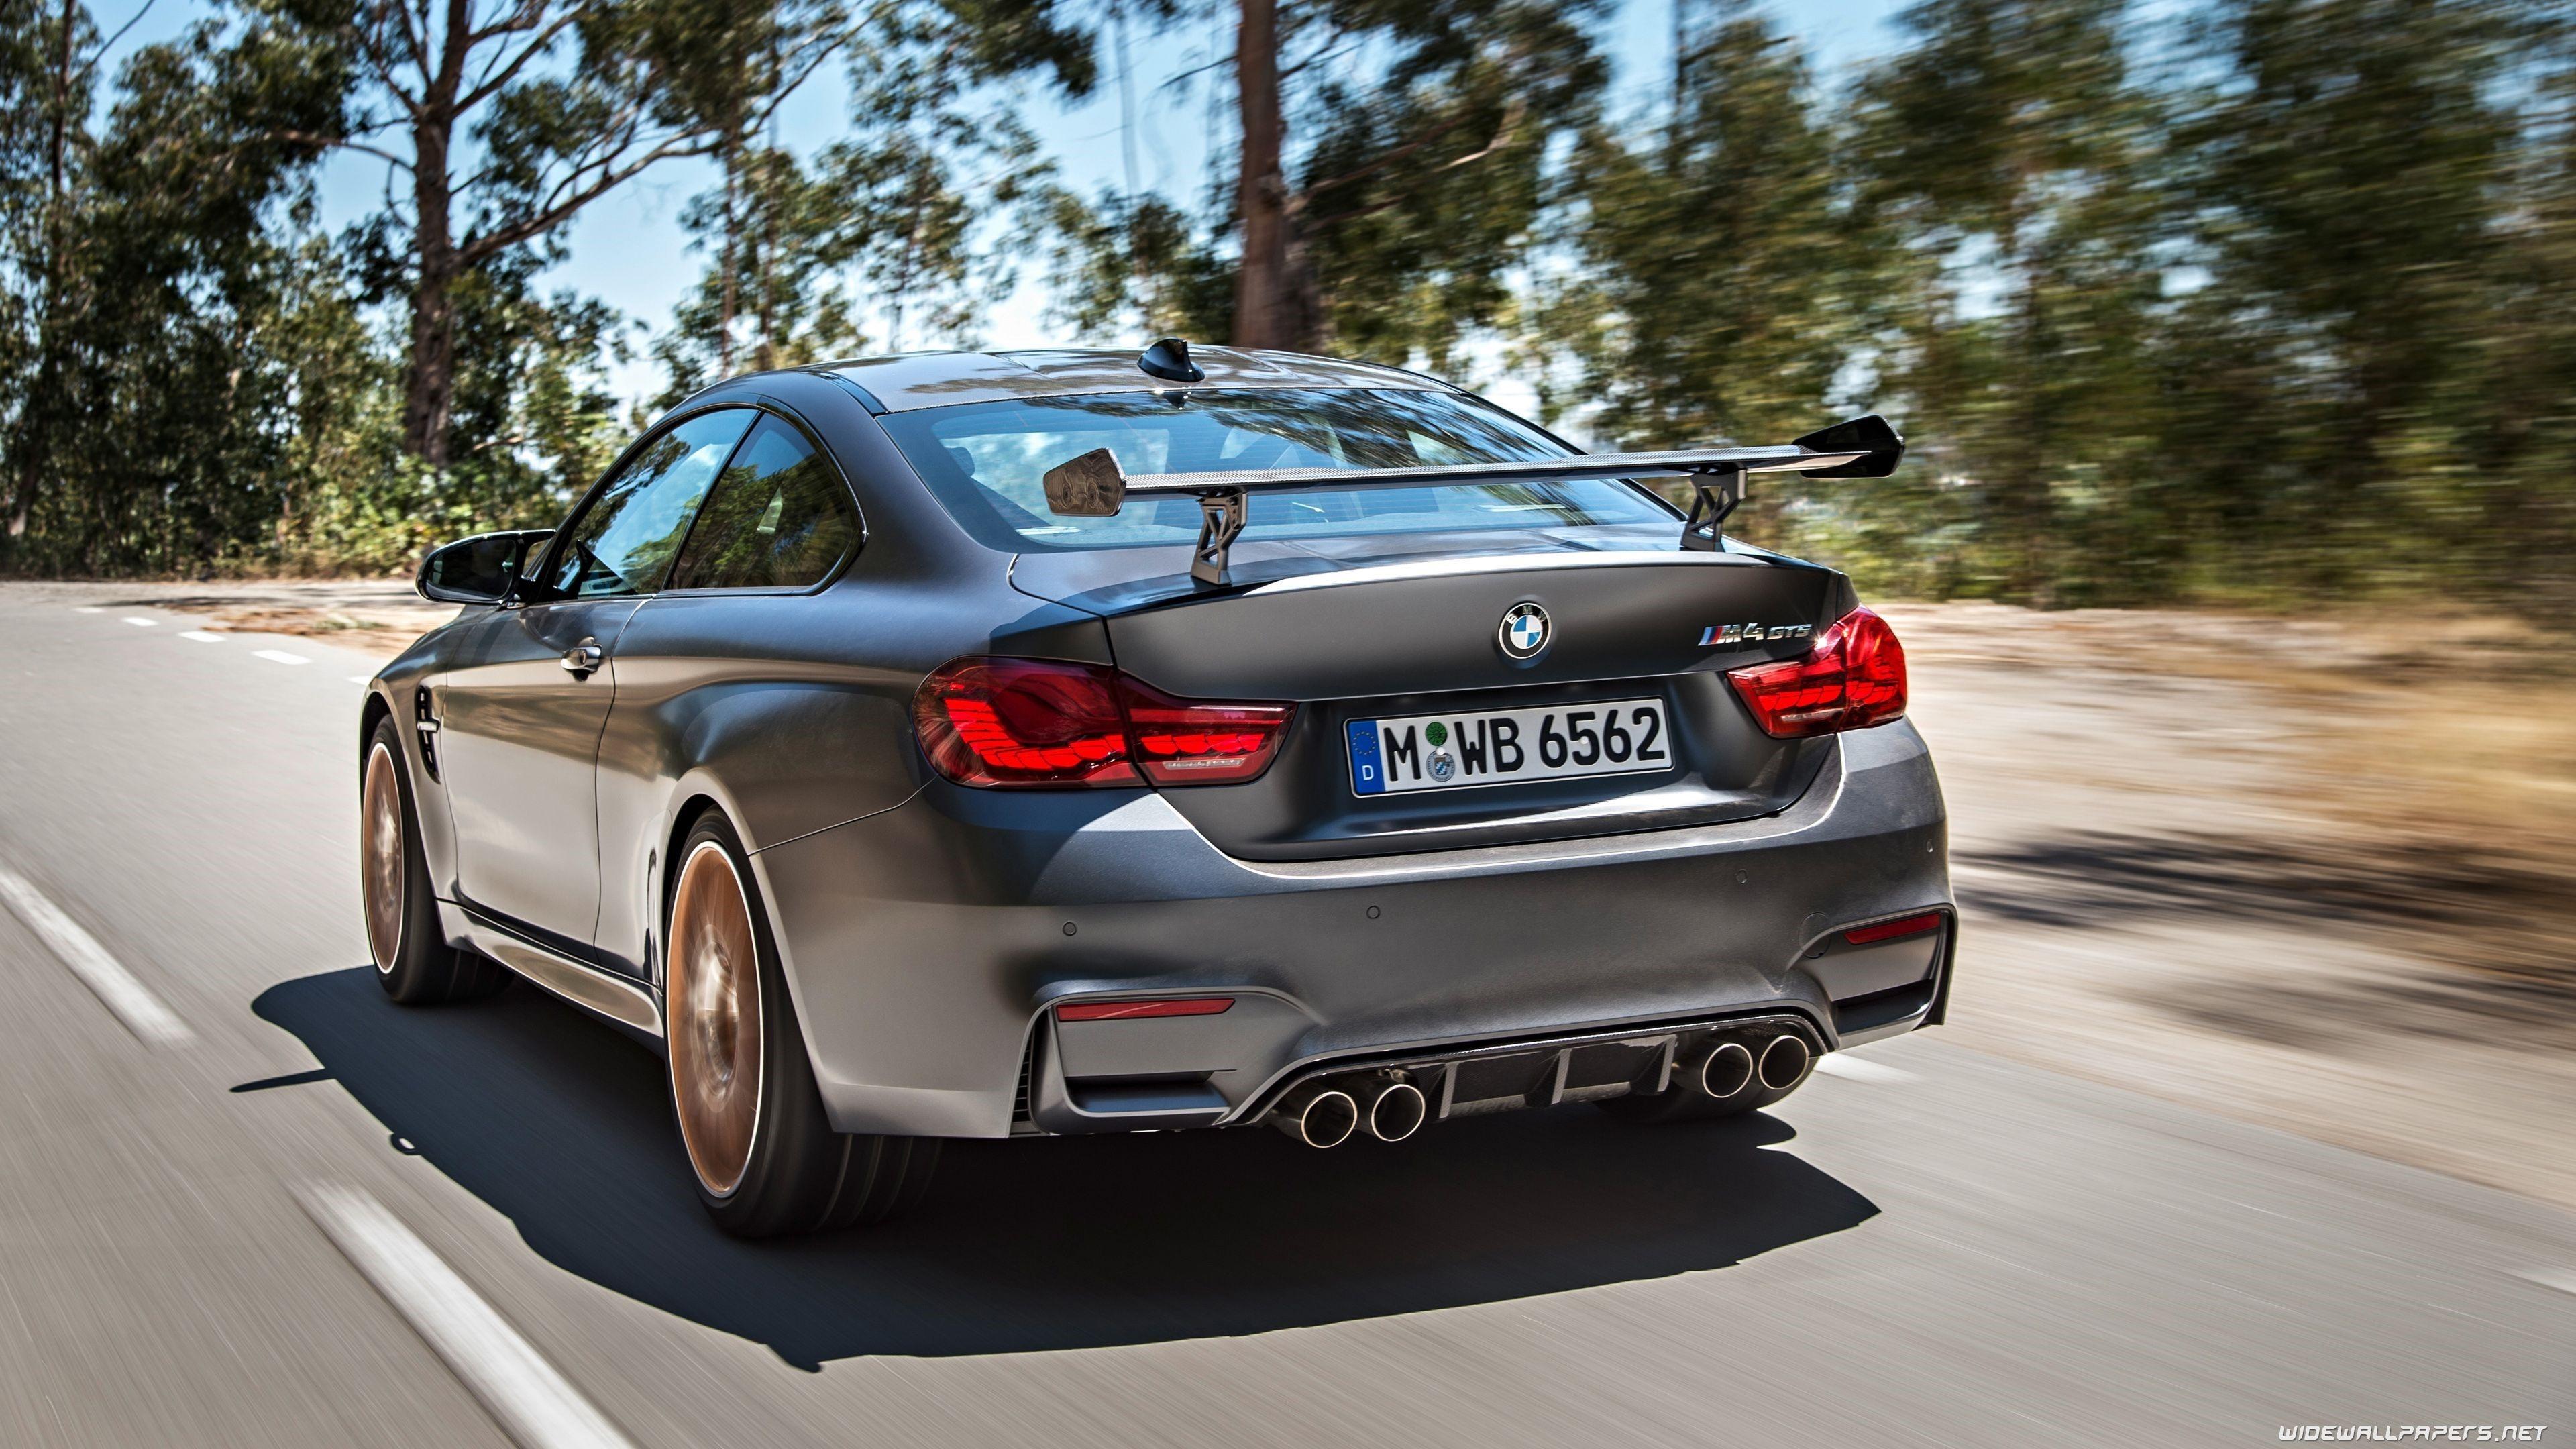 4K BMW Gallery